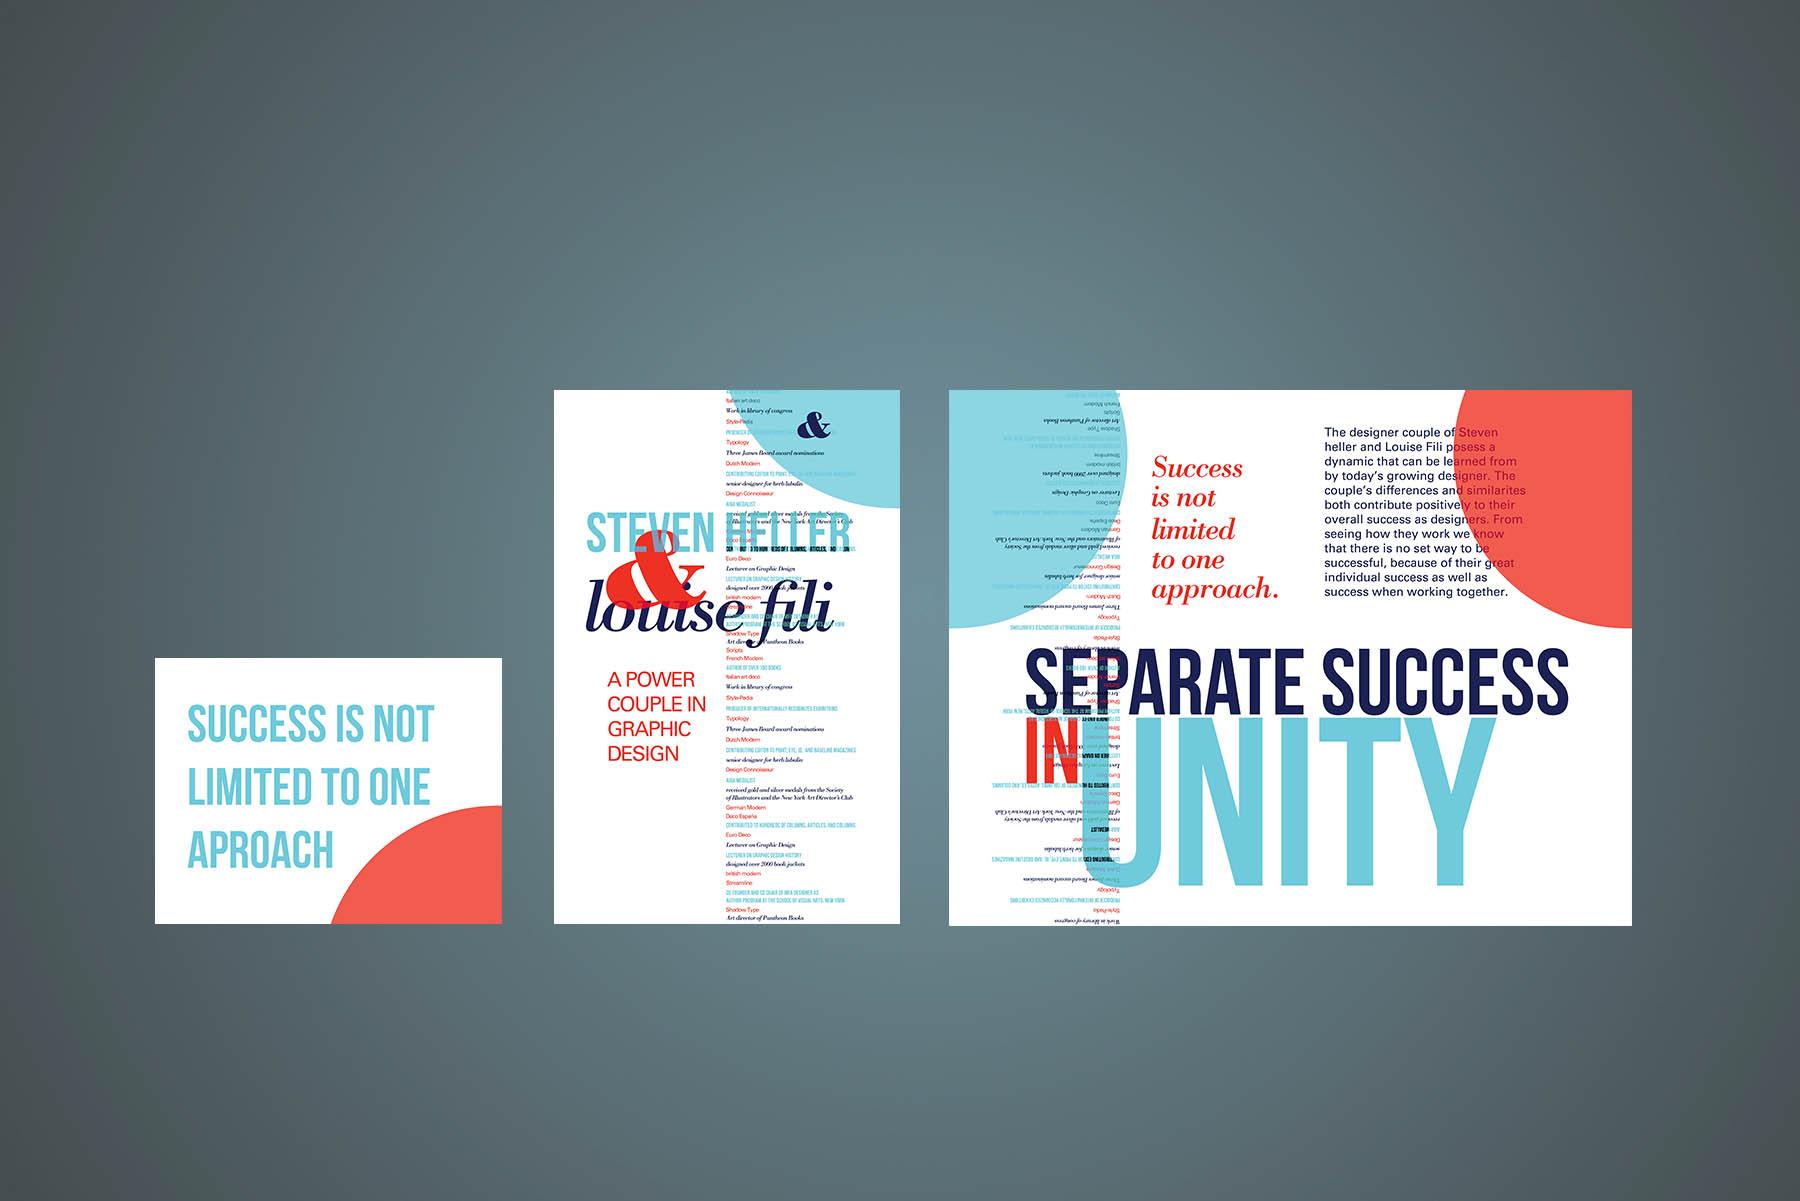 Separate Success in Unity